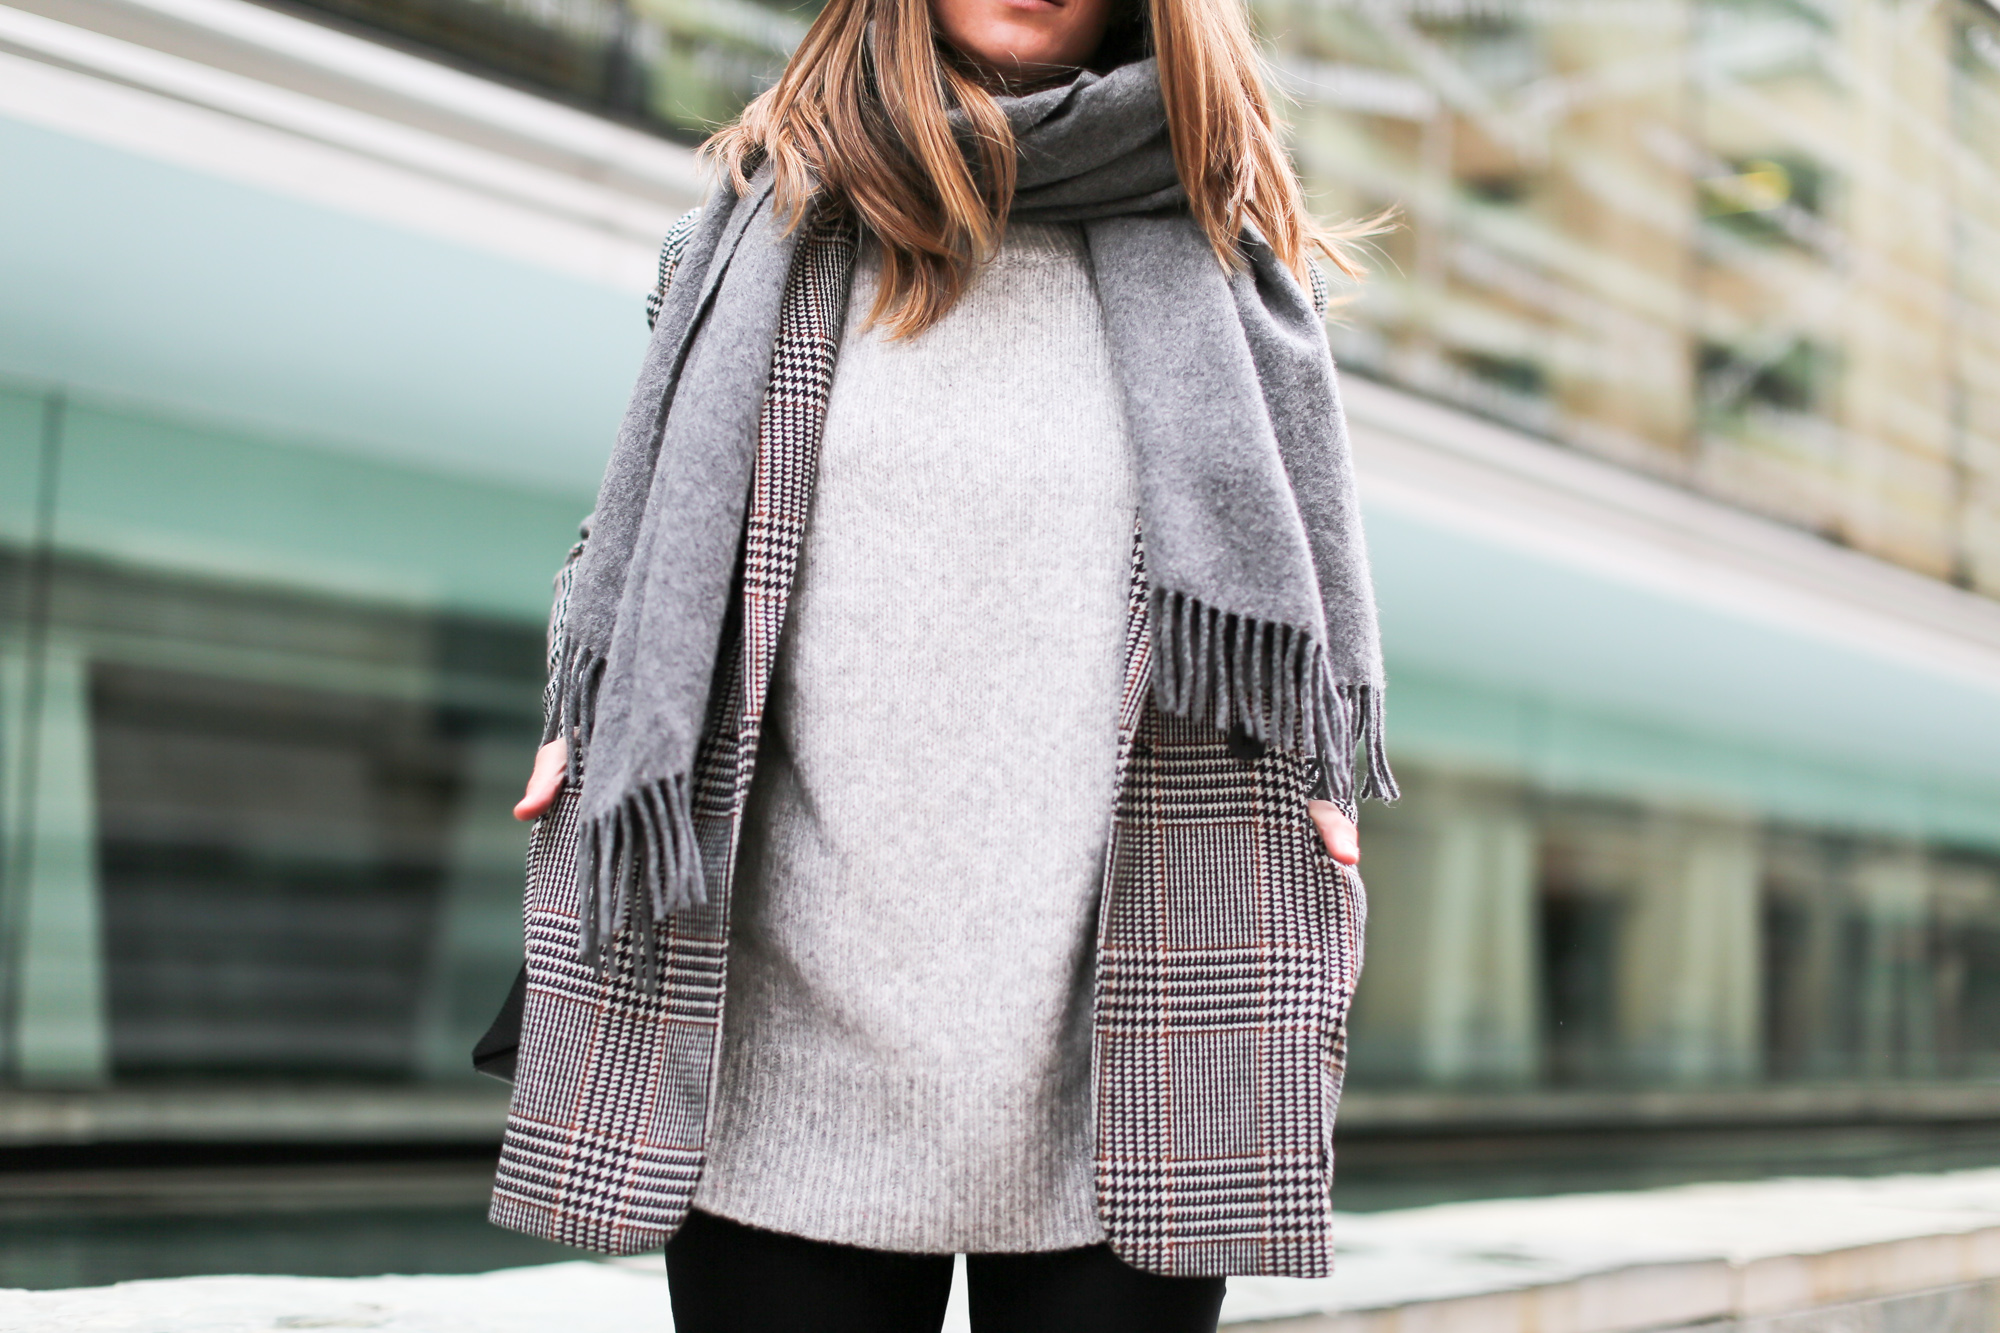 Clochet_streetstyle_fashionblogger_zapatosoxfordtachuelasPertini_bolsotangrampurificaciongarcia-5